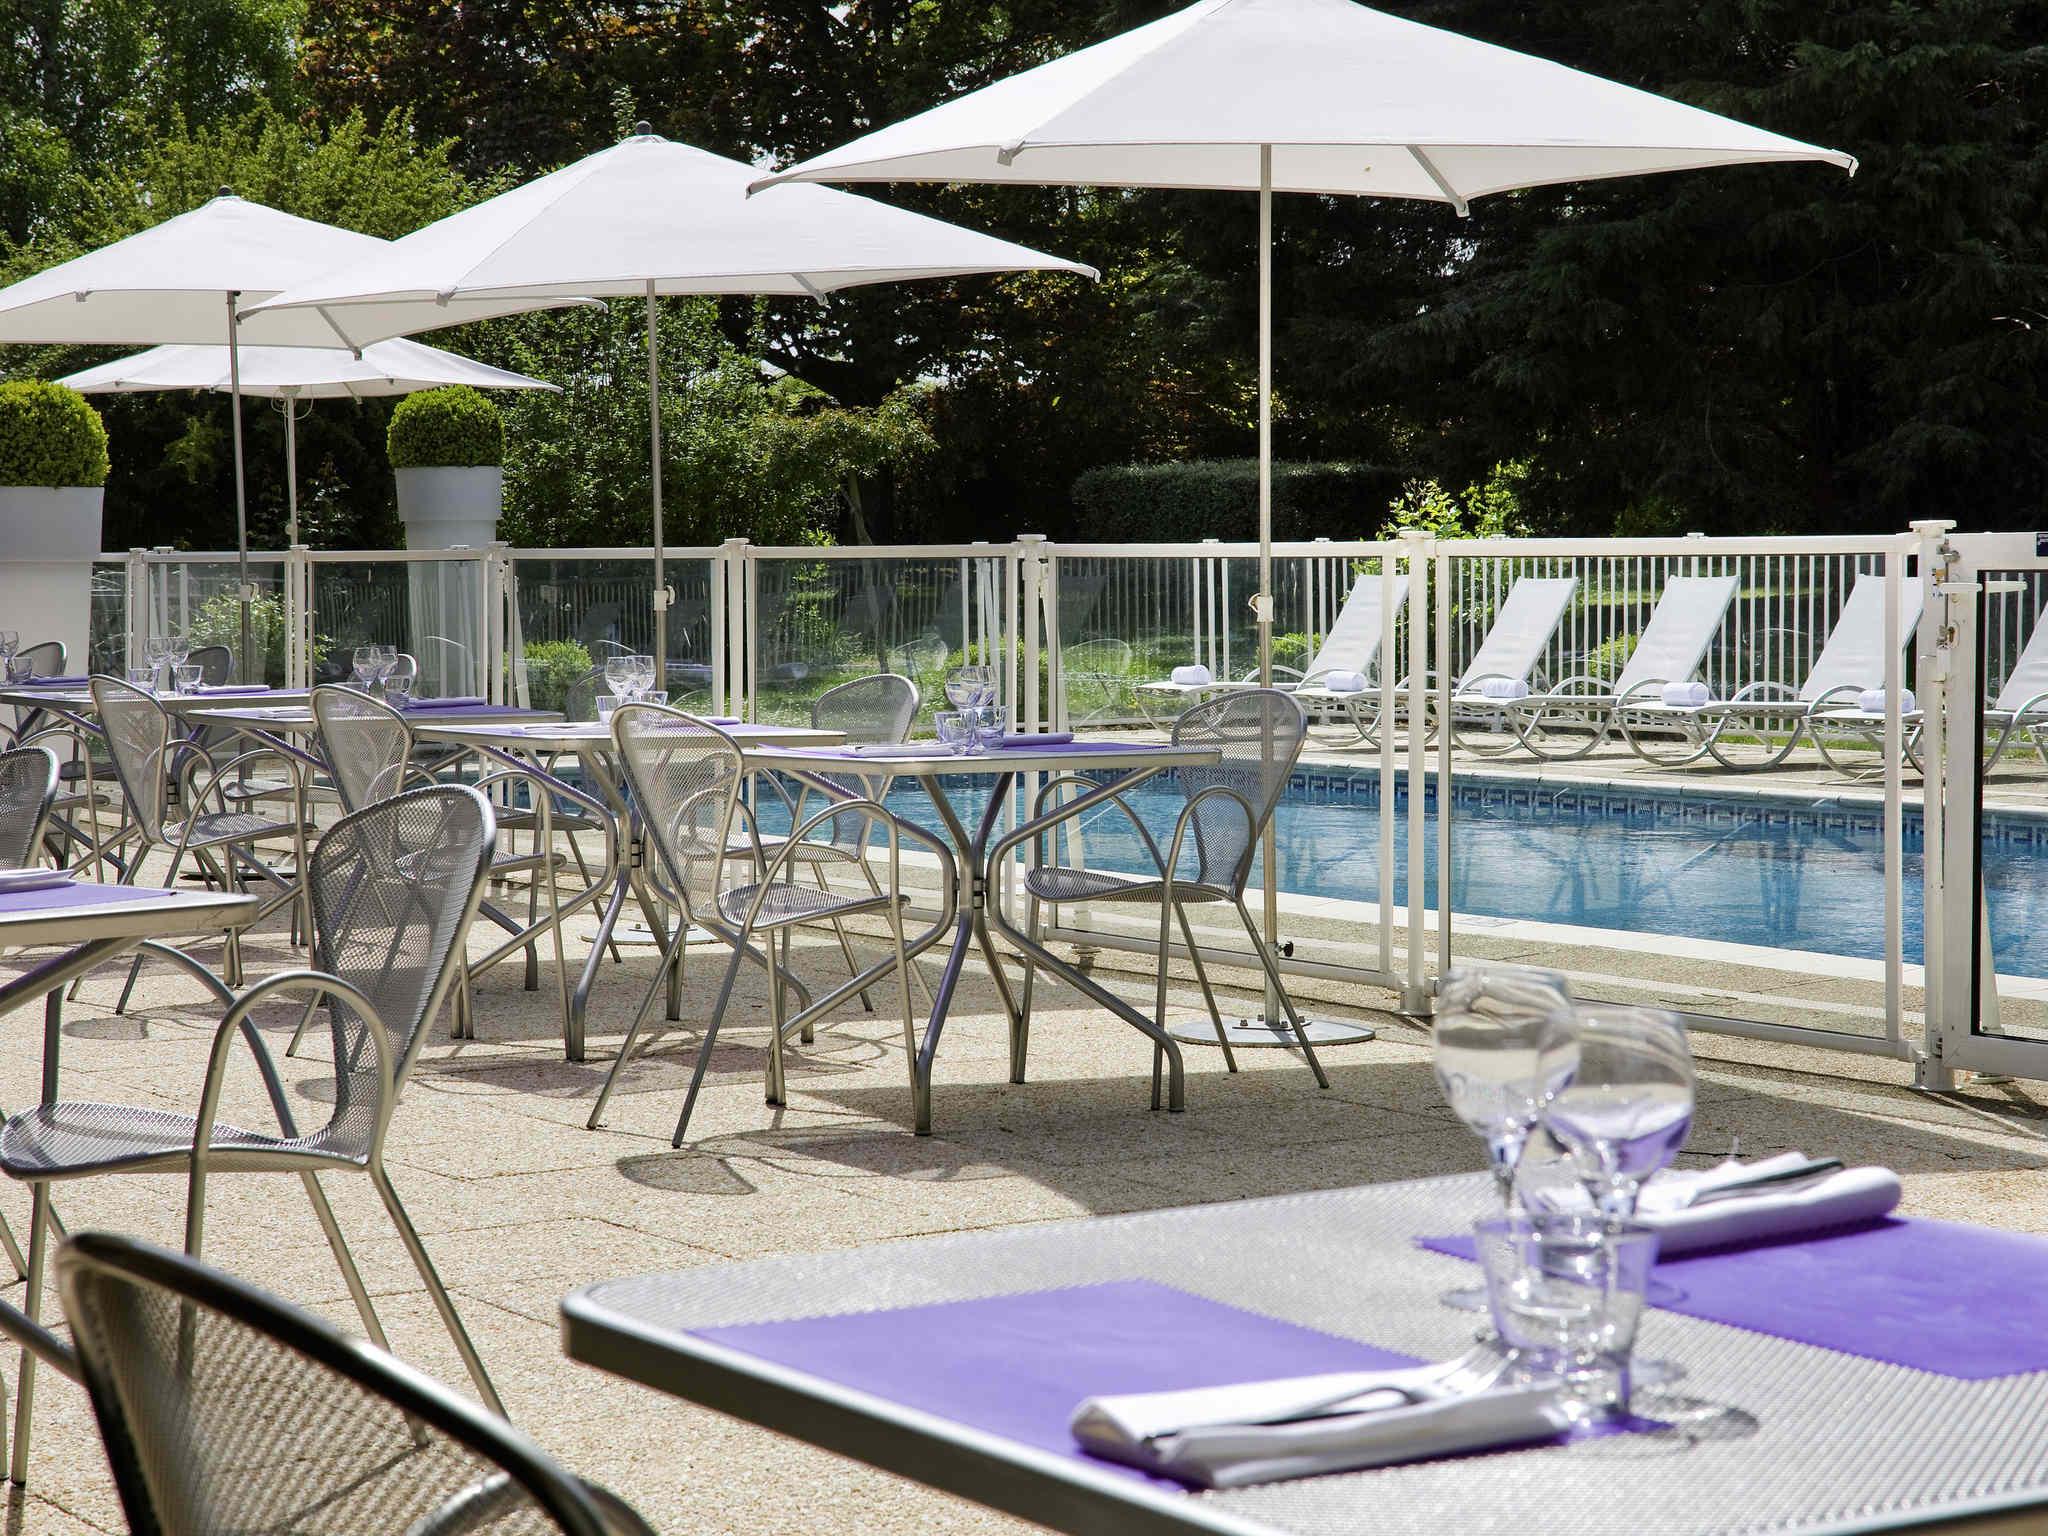 Отель — Novotel Marne La Vallée Noisy Le Grand